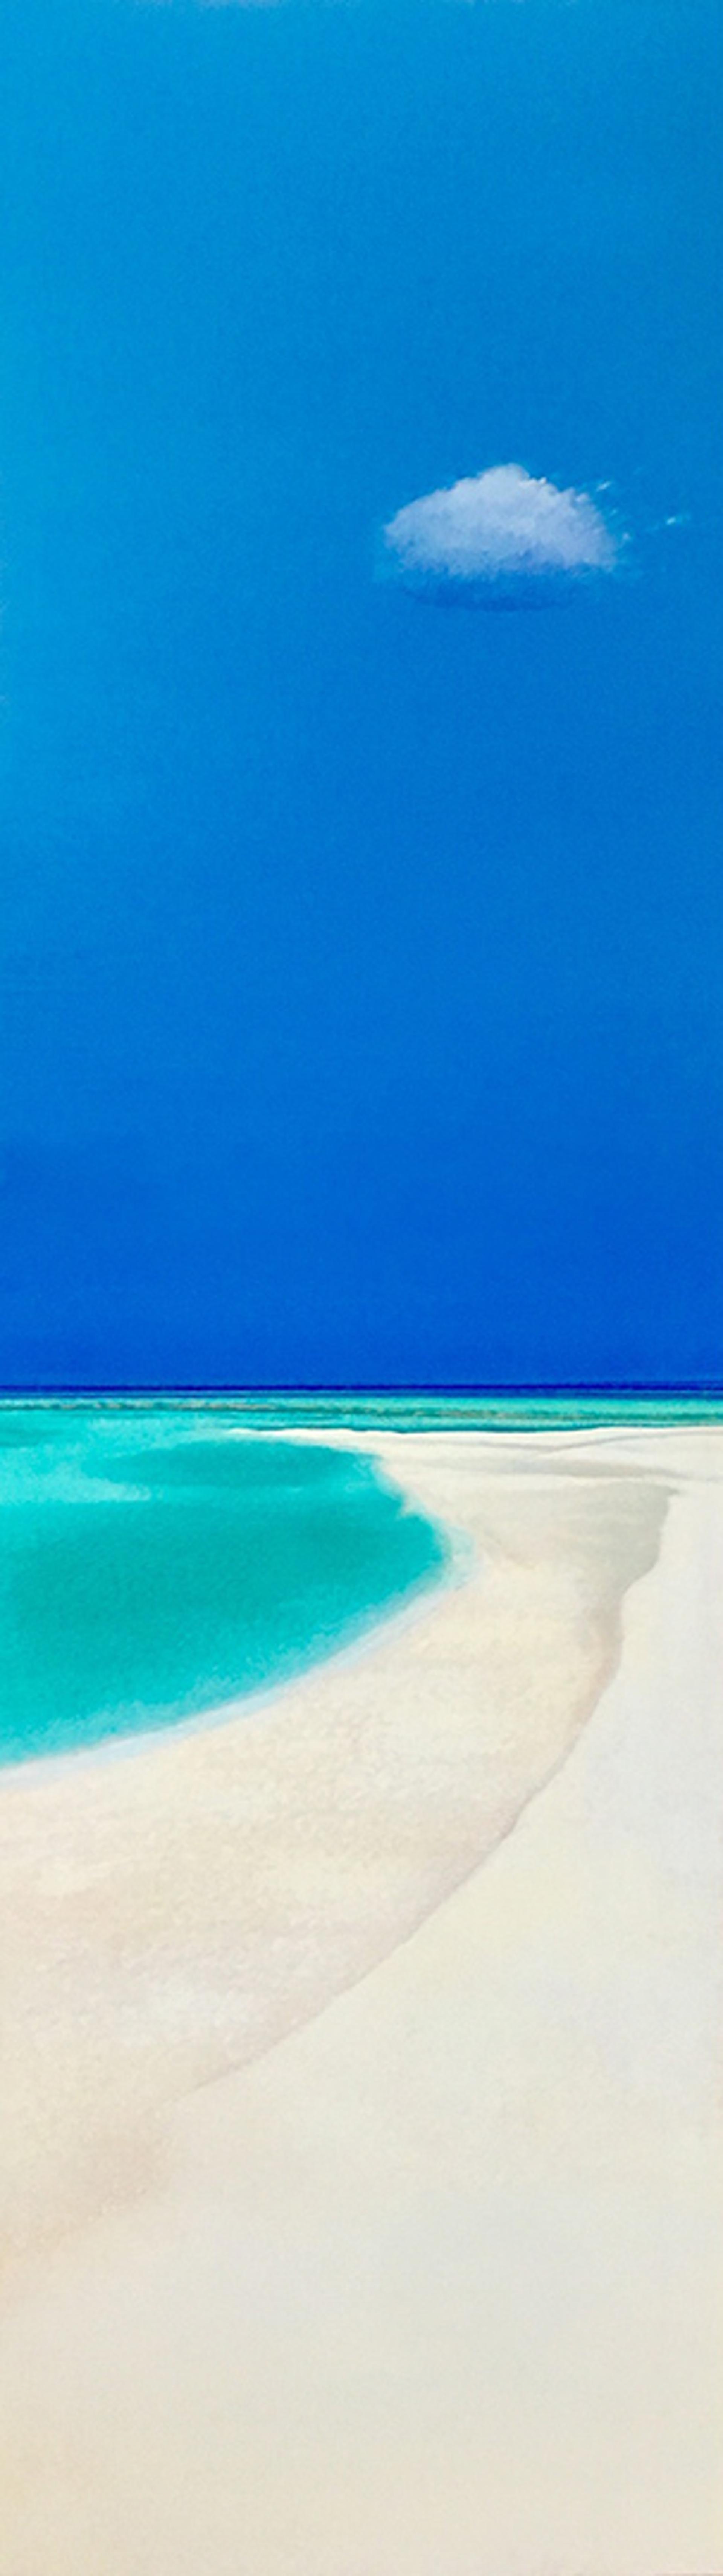 Somewhere In The White Sand by Andrea Razzauti